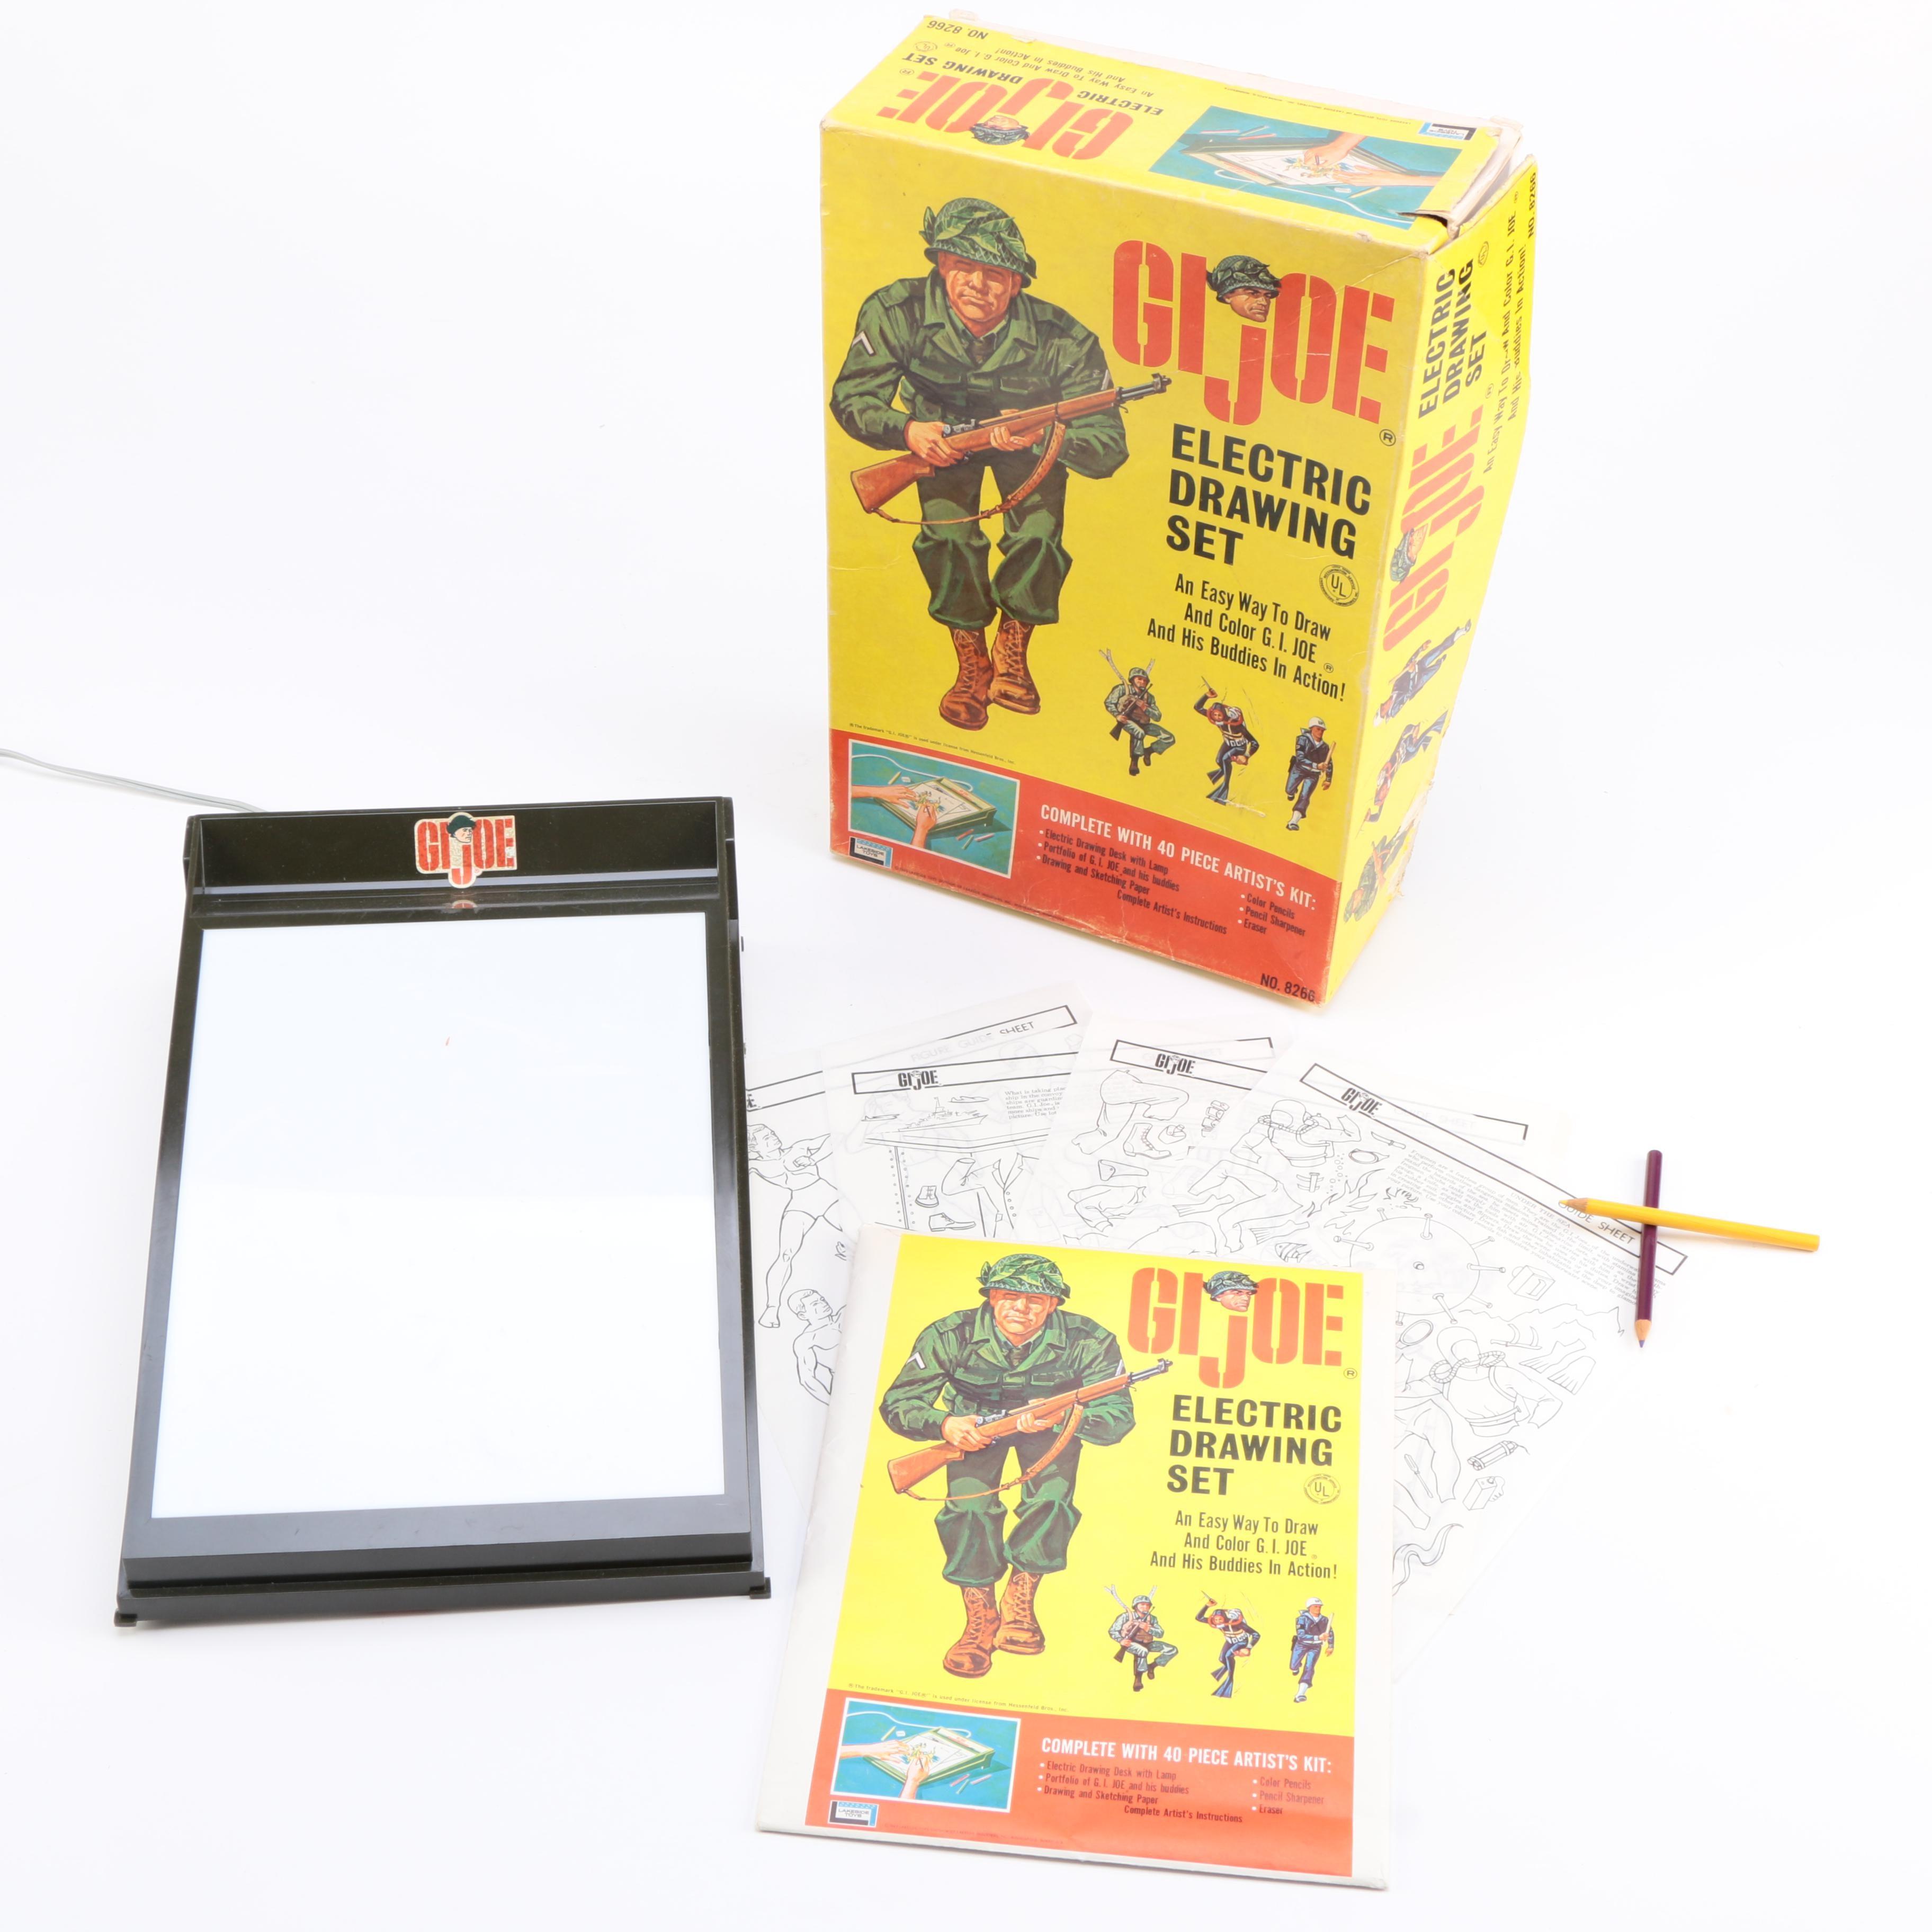 1960s G. I. Joe Electric Drawing Set